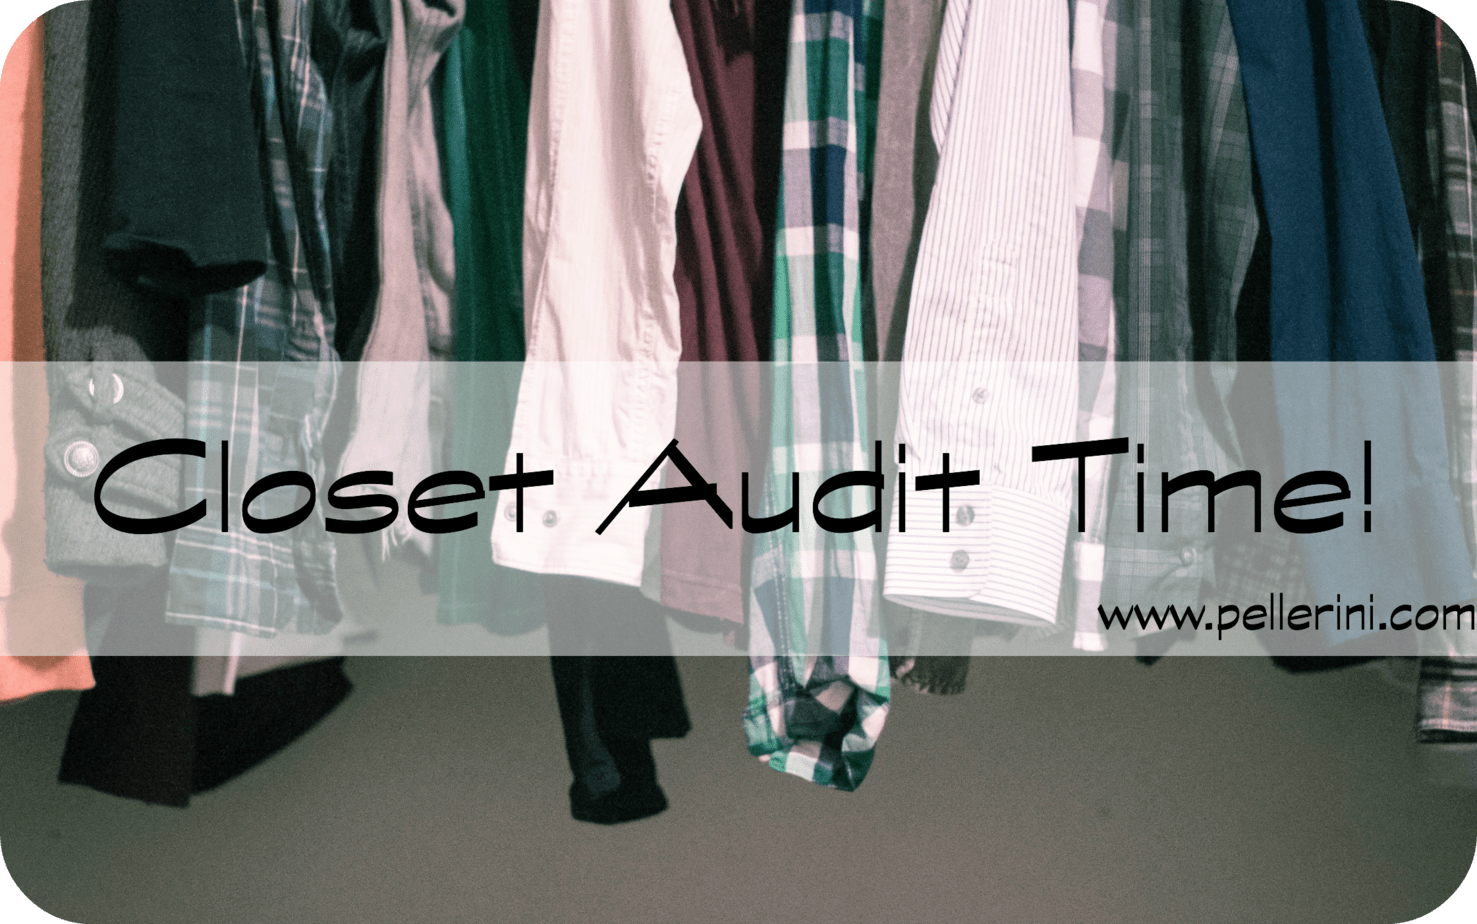 closet audit time